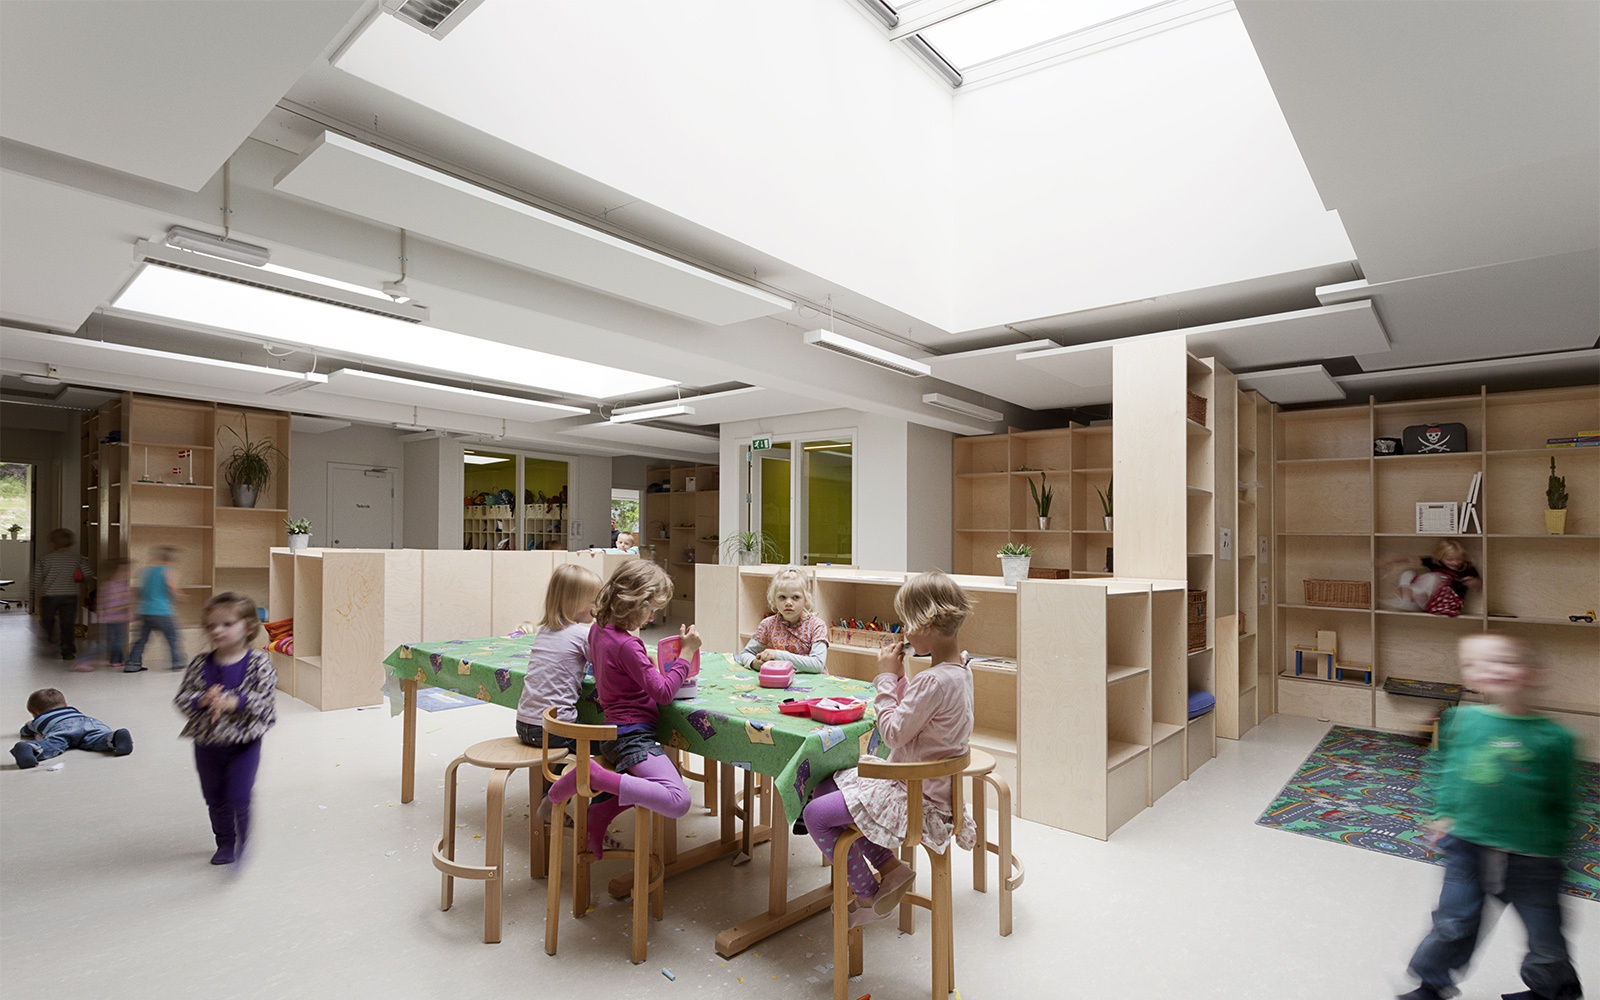 Operable windows for natural ventilation in school design